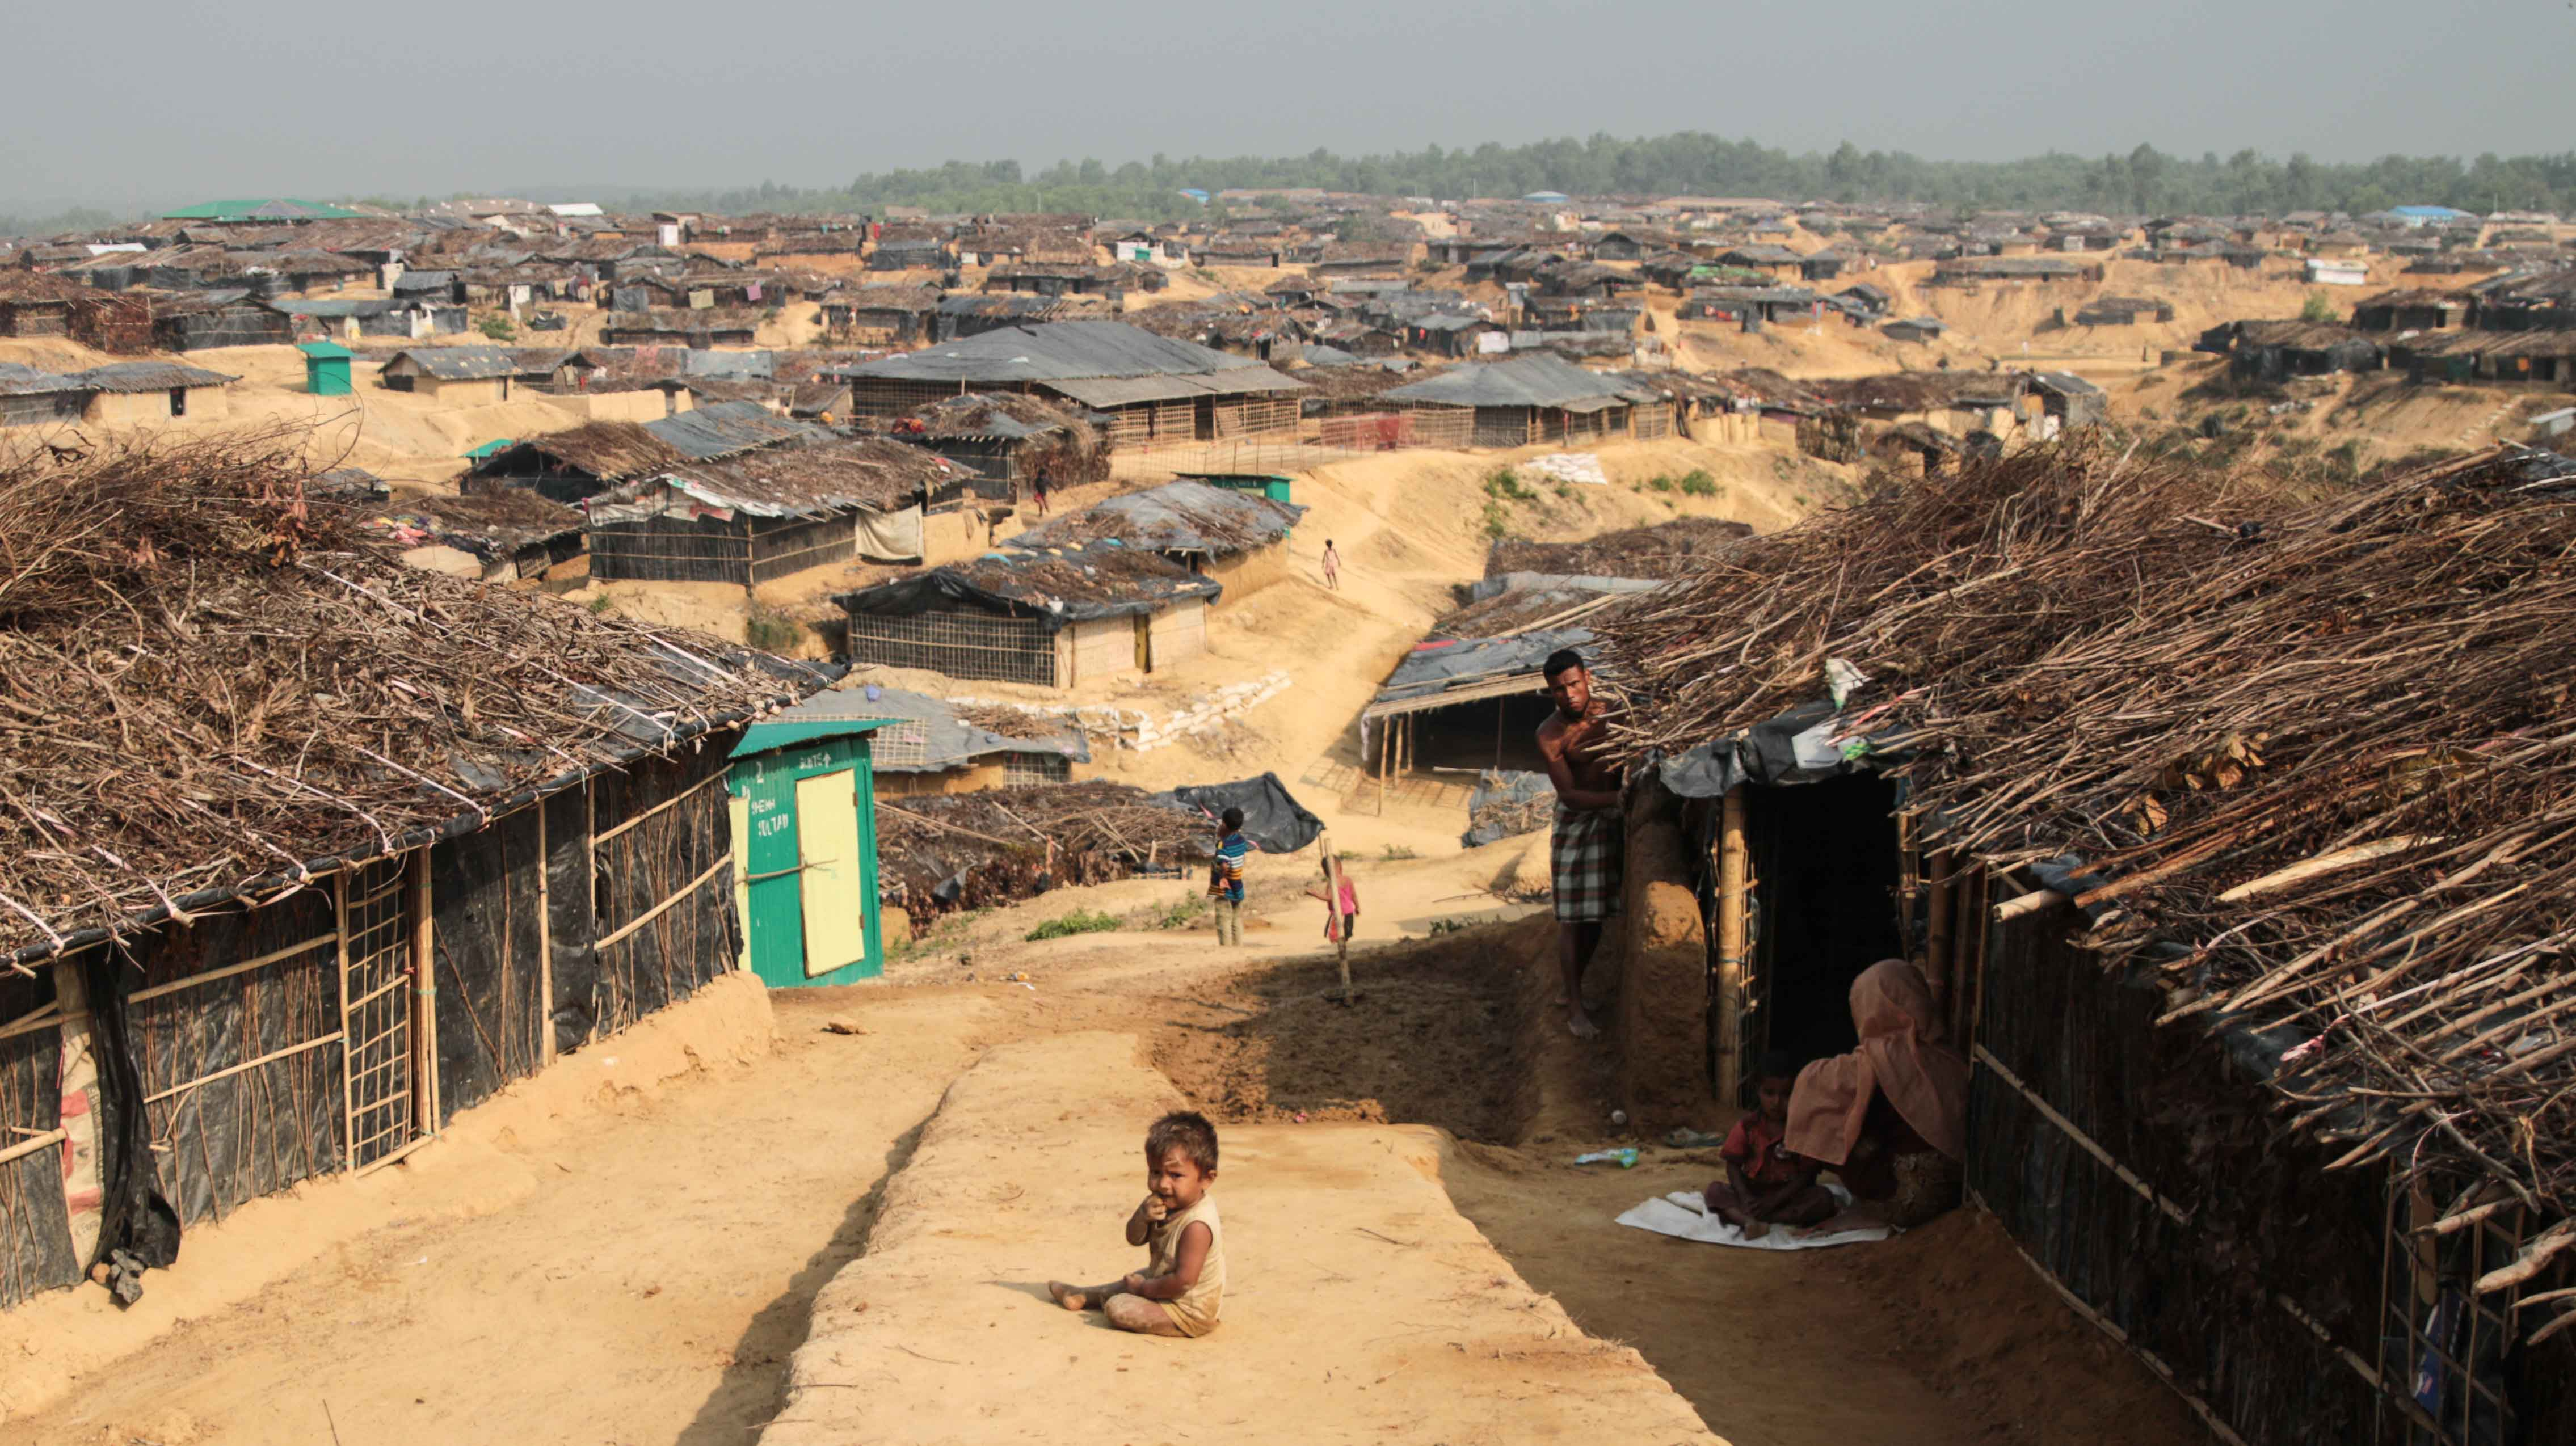 ООН: +11,400 Мусульман Рохинья бежали из Мьянмы в 2018 году